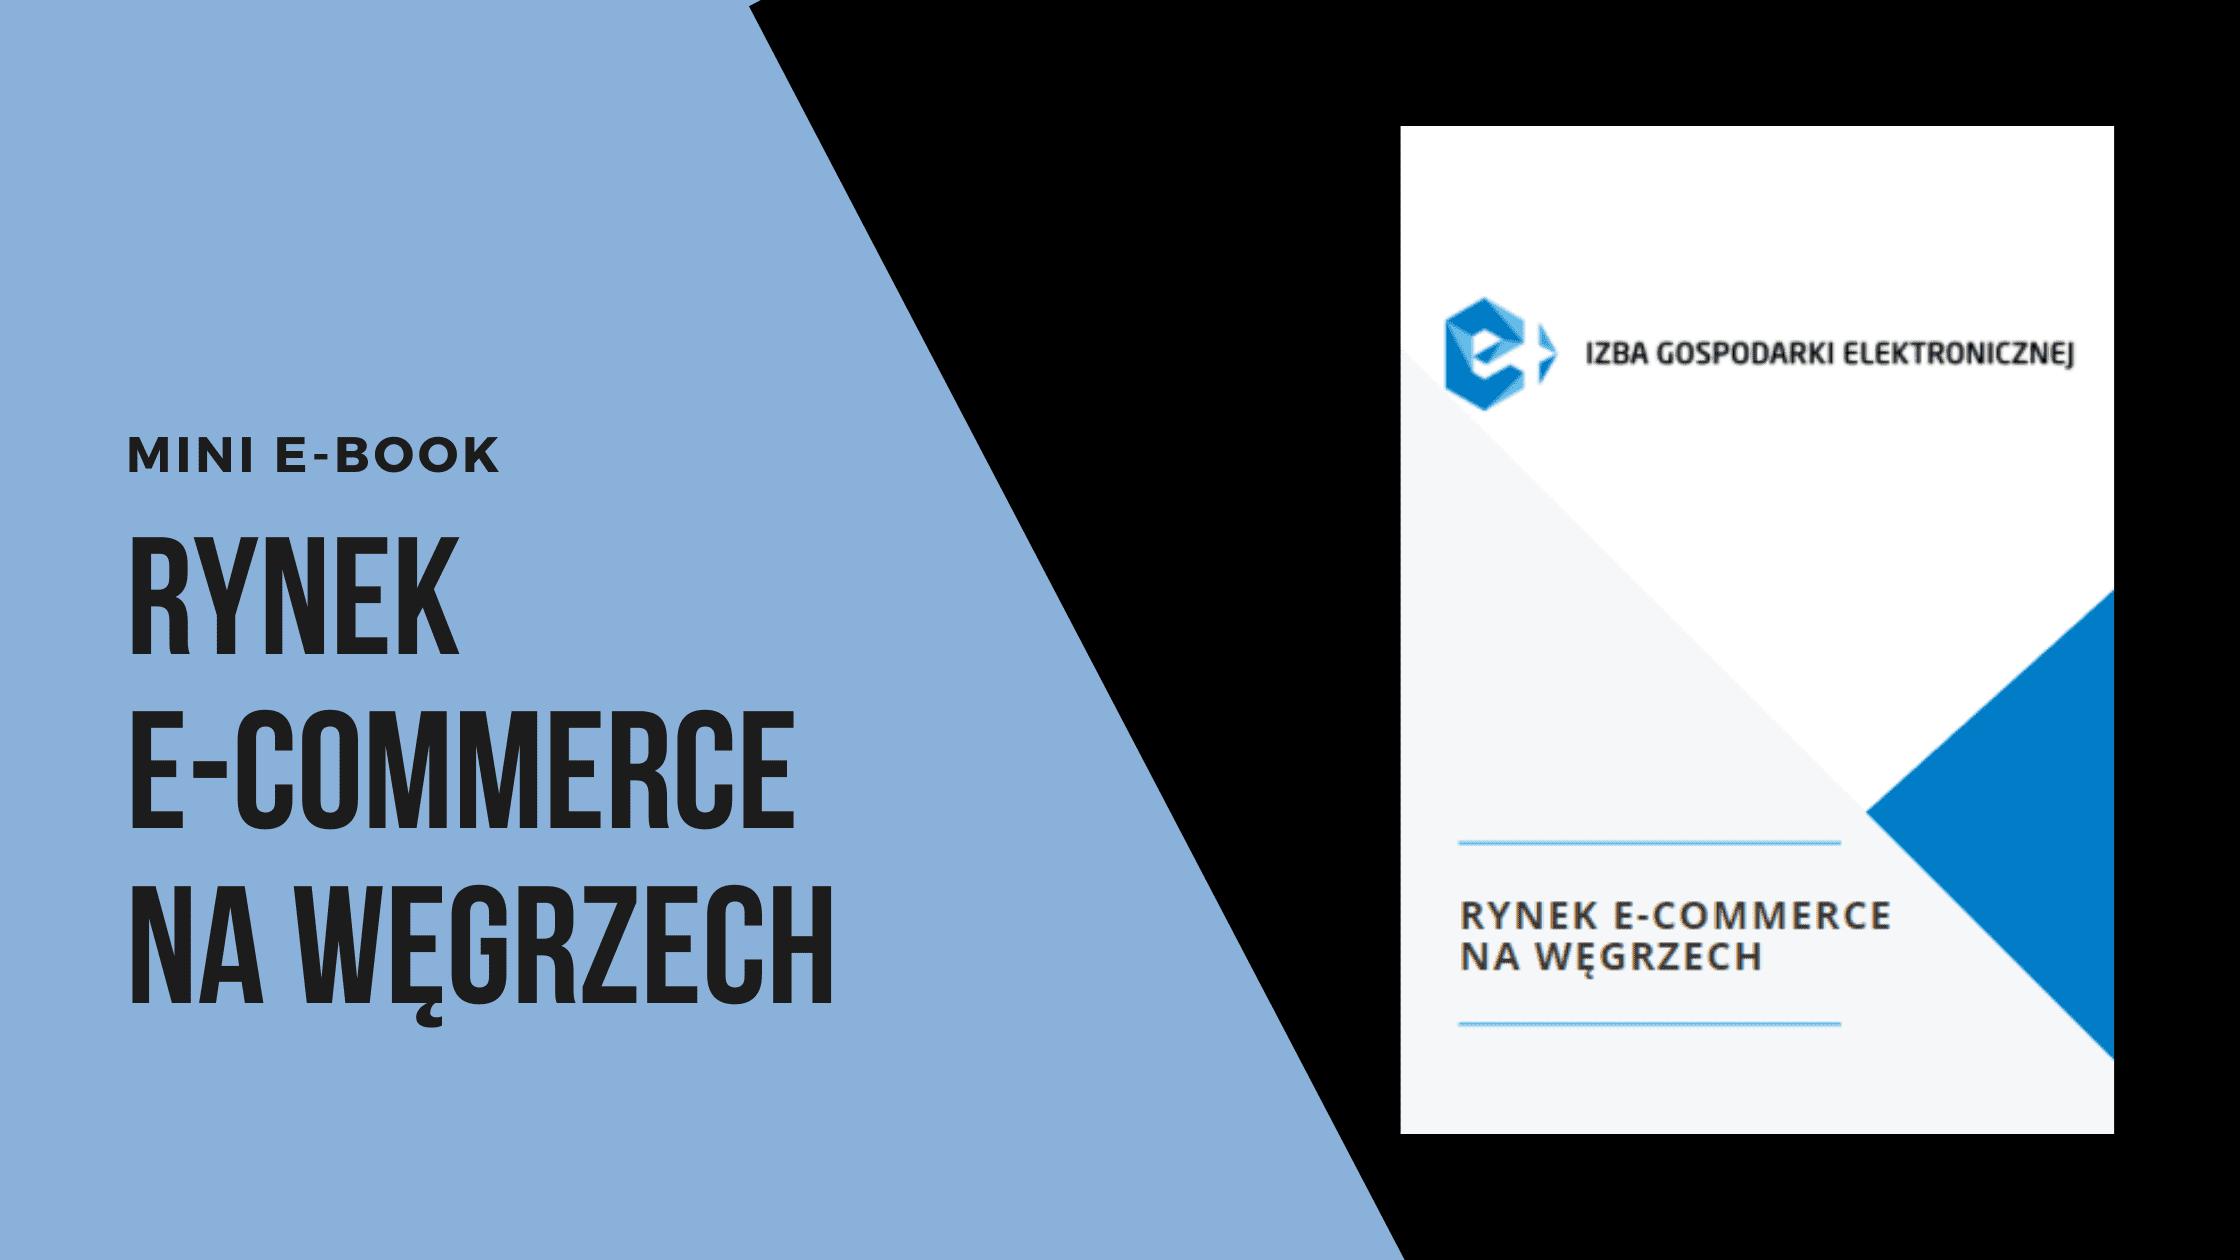 Rynek e-commerce na Węgrzech